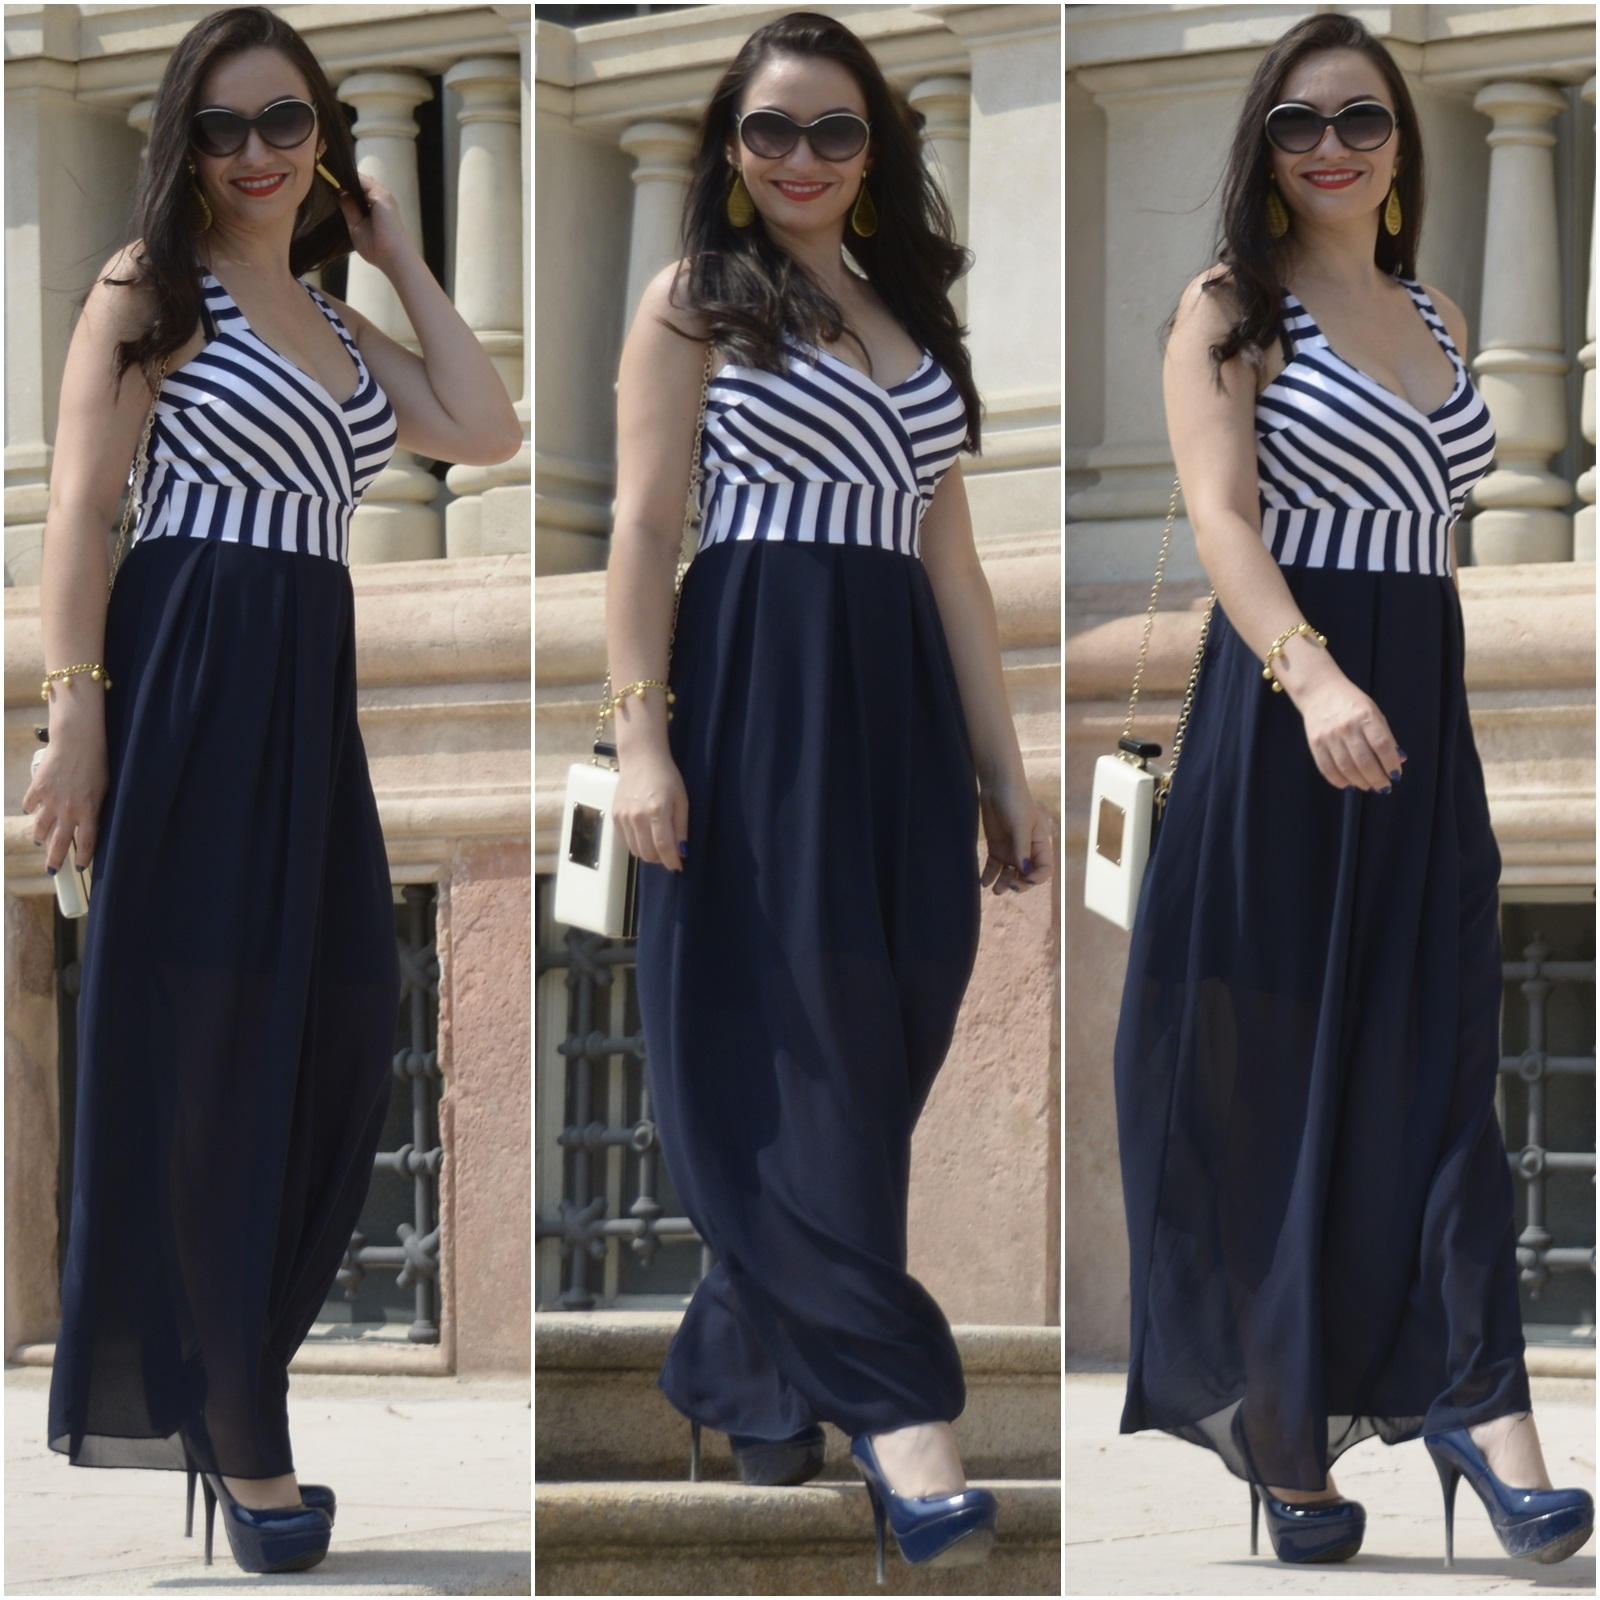 vestido-estilo-navy-longo-nathália-ferrara-11